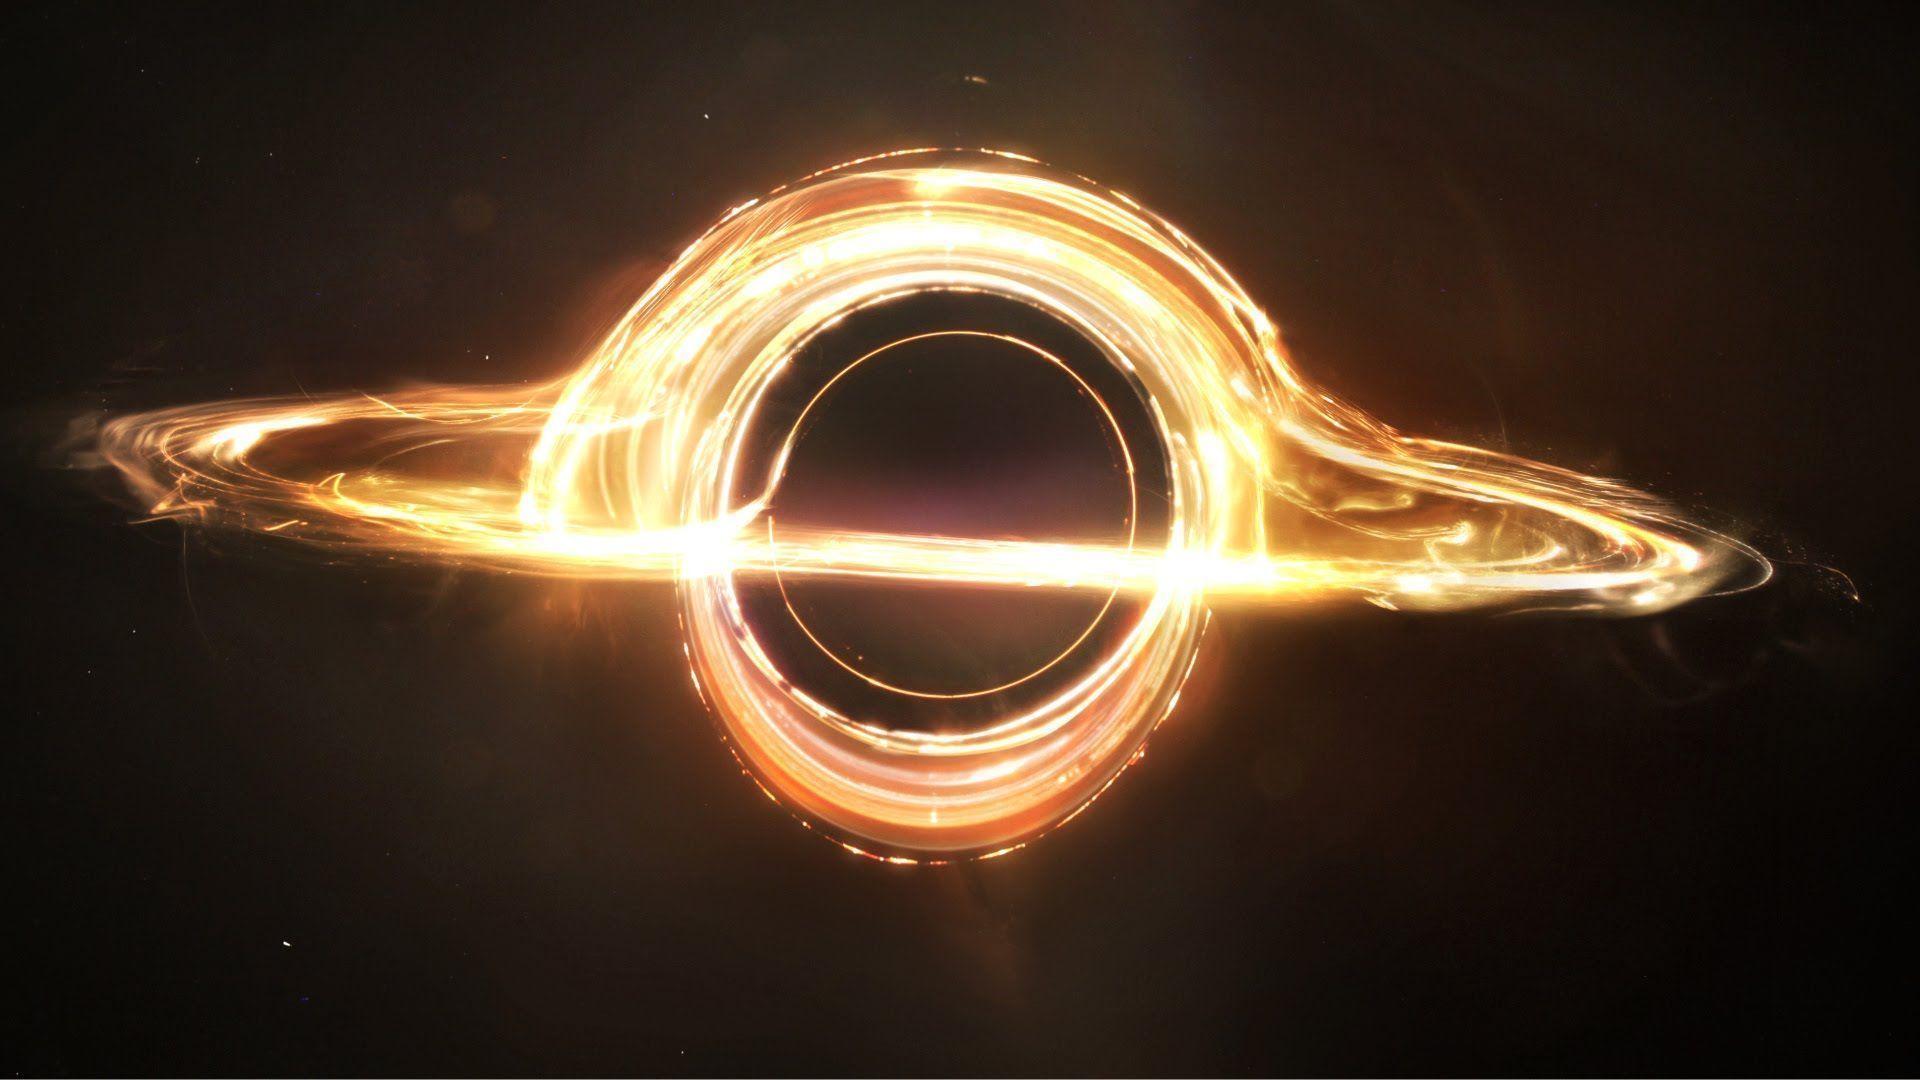 4K Black Hole Wallpapers - Top Free 4K Black Hole ...